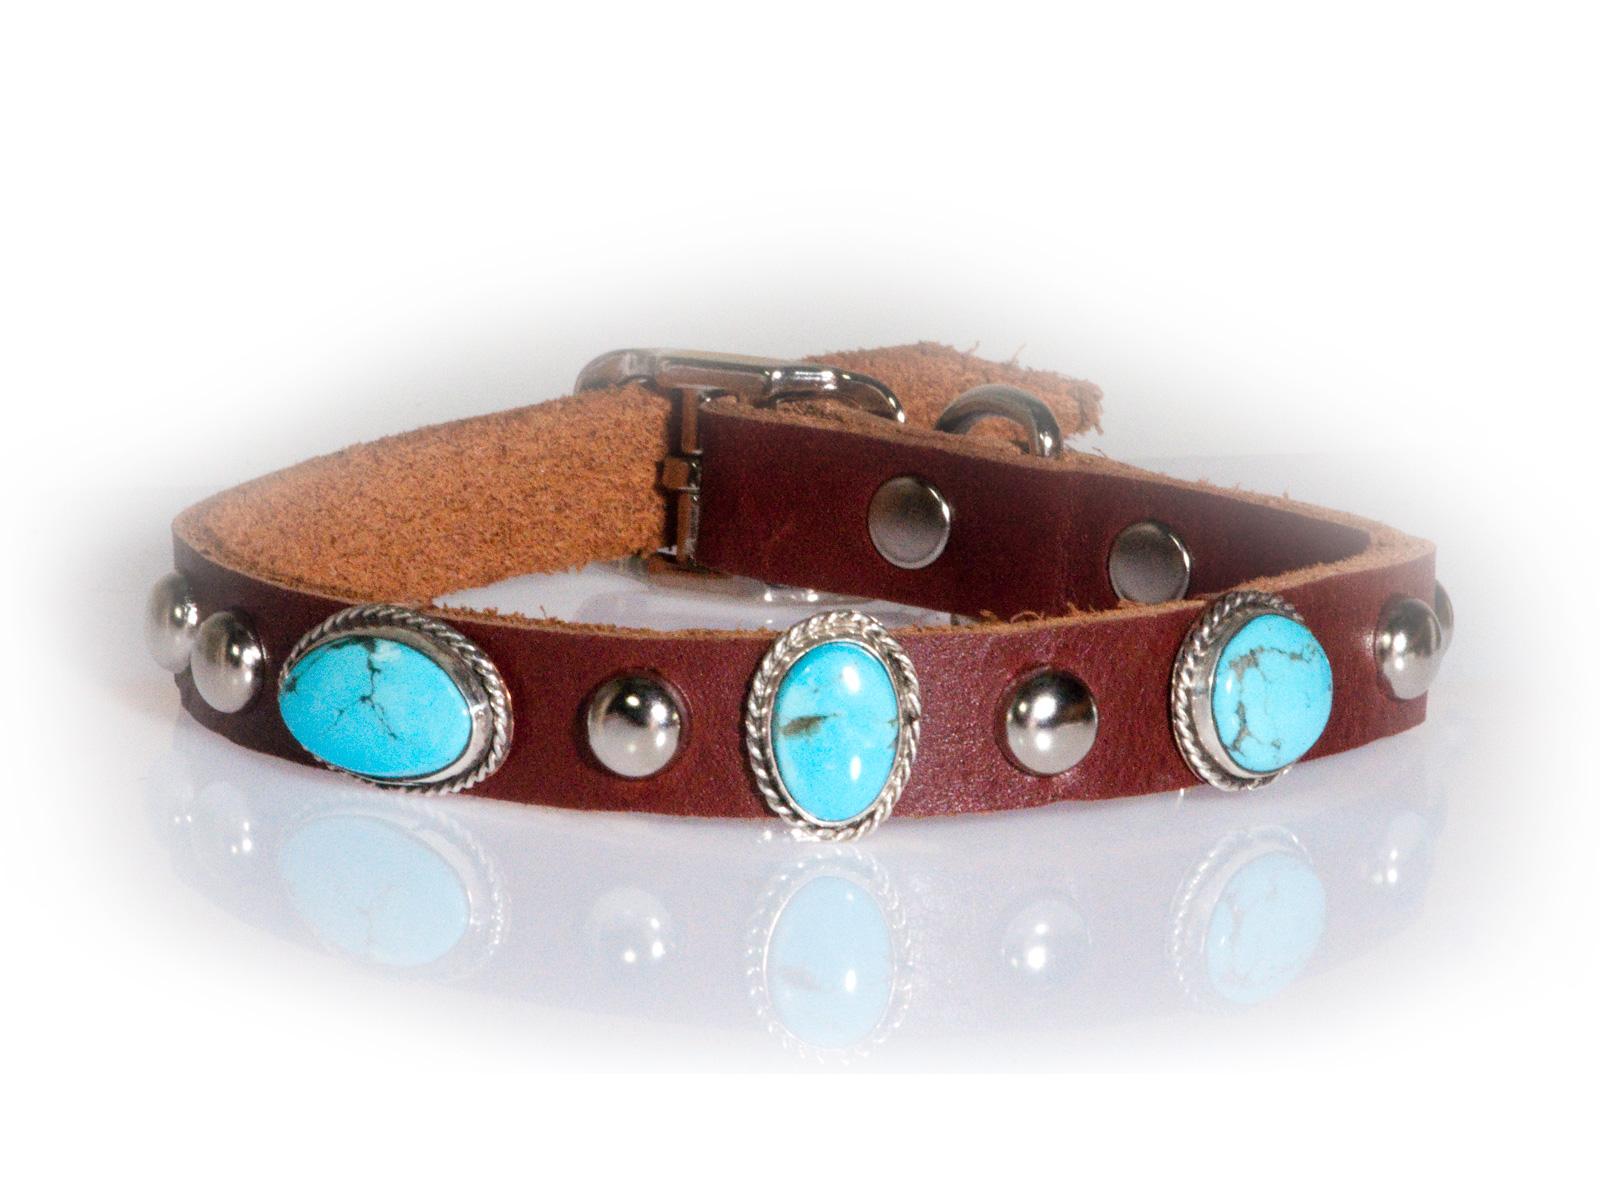 3 Stone Turquoise Dog Collar